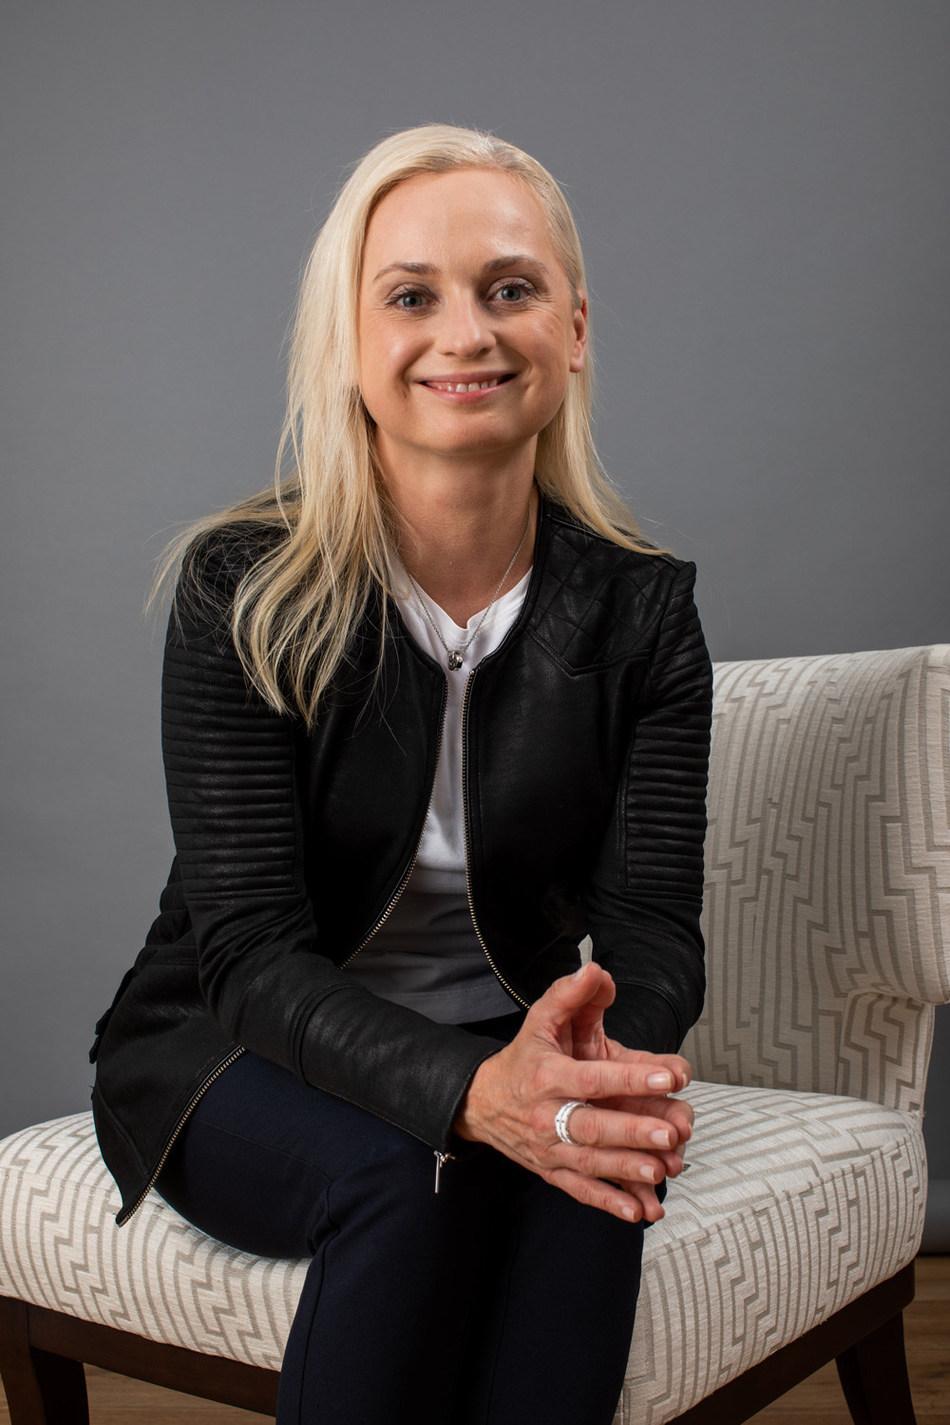 Veronica Rogers, Sony Interactive Entertainment